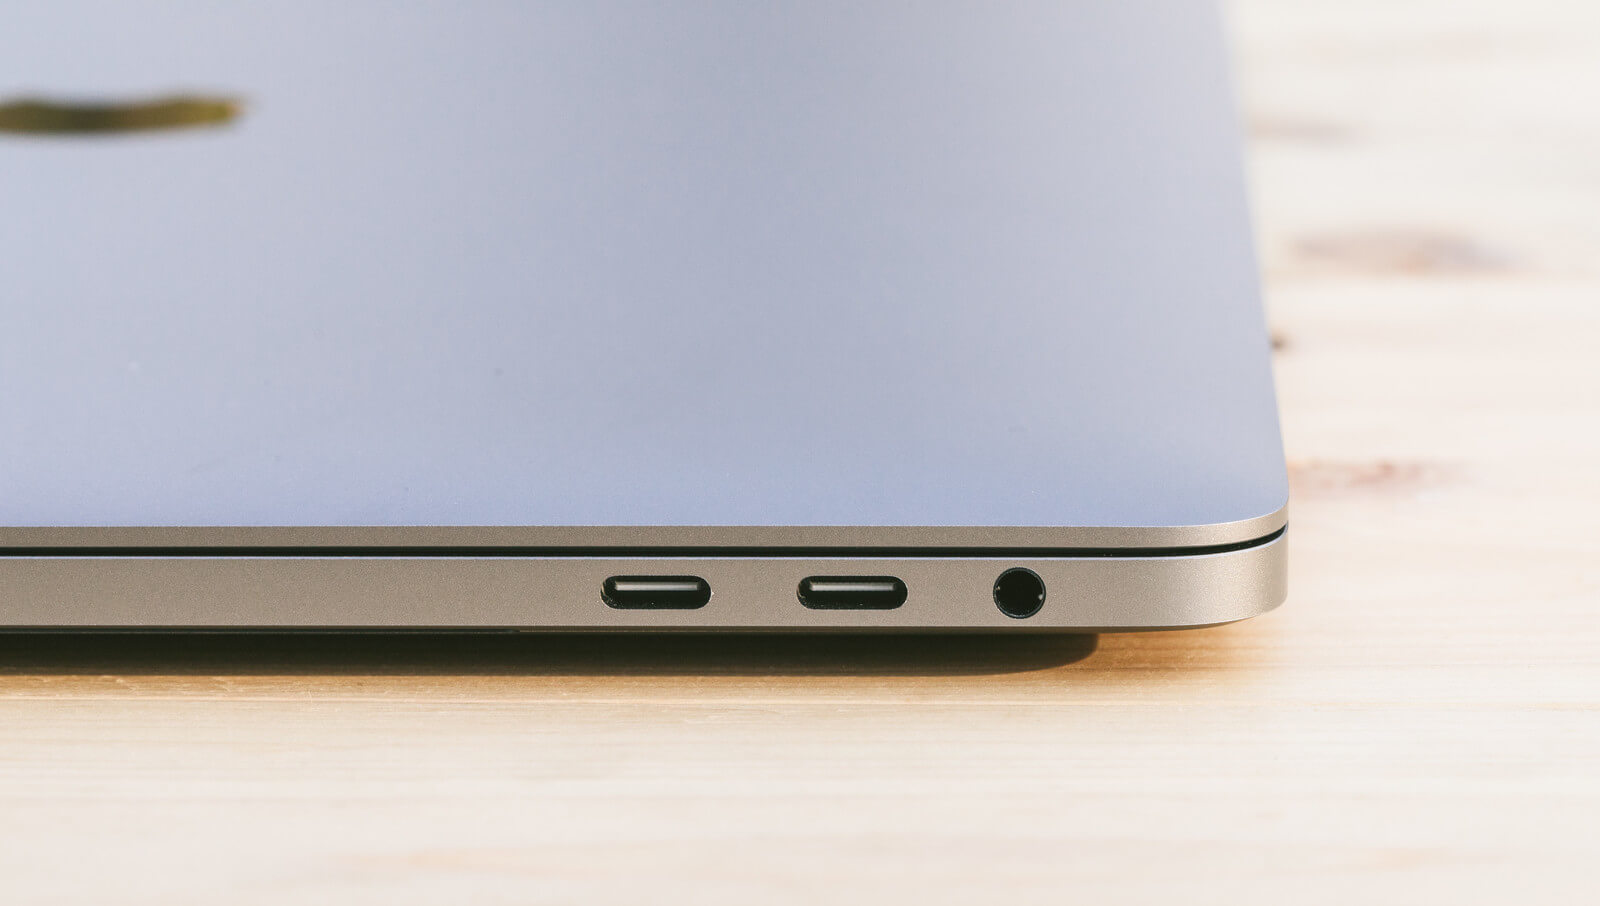 MacbookのUSBtype-cコネクタ